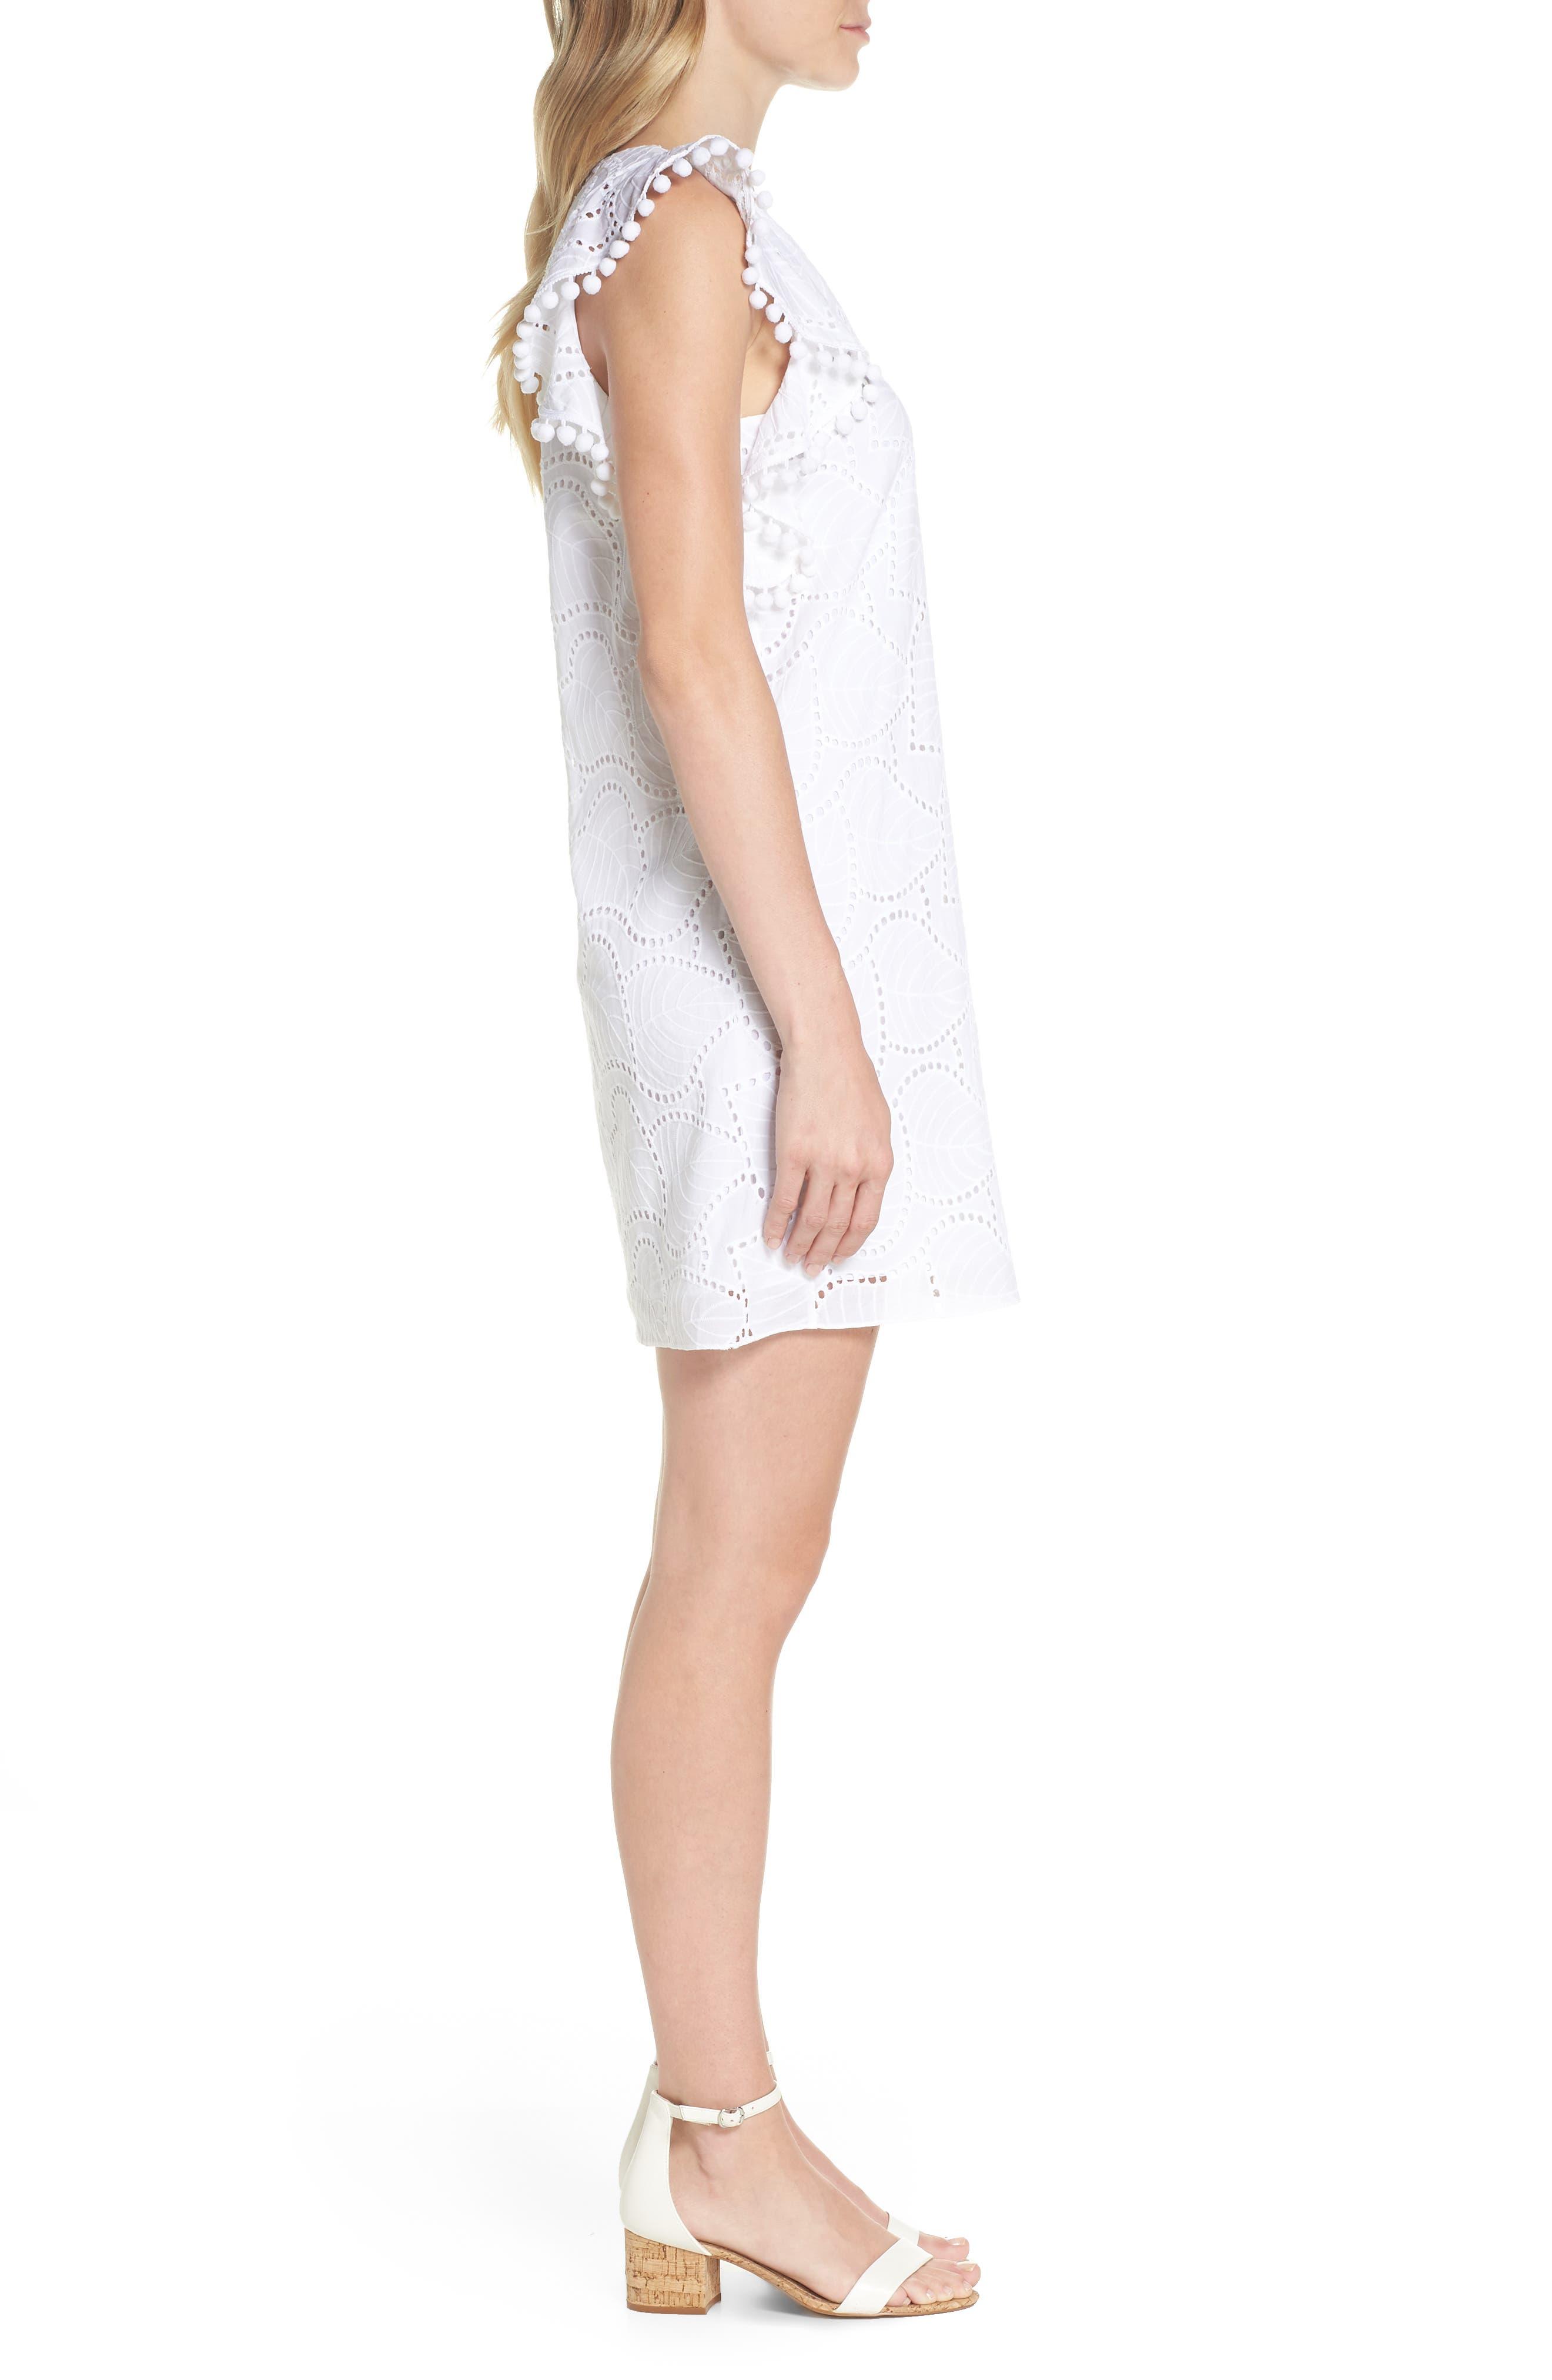 Astara Cotton Eyelet Dress,                             Alternate thumbnail 3, color,                             Resort White Leaf Eyelet